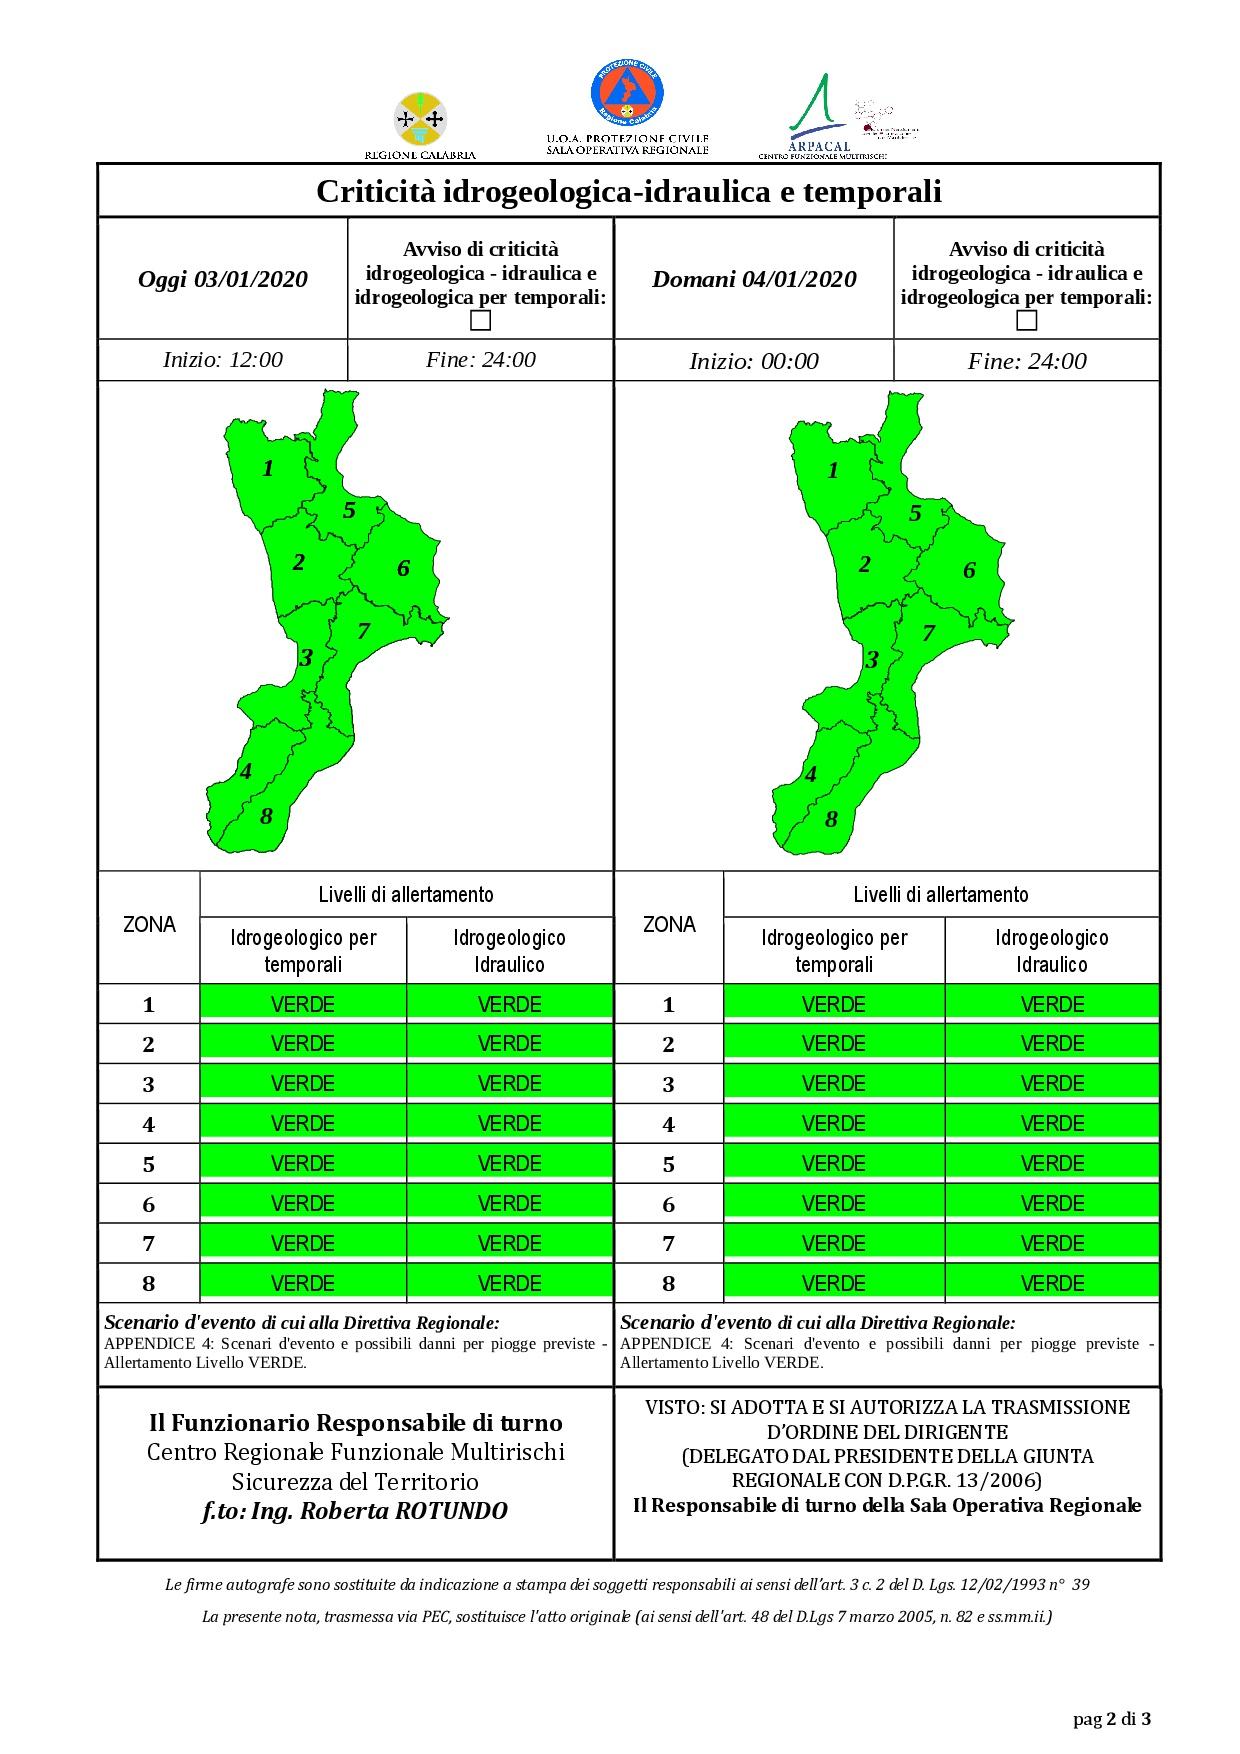 Criticità idrogeologica-idraulica e temporali in Calabria 03-01-2020